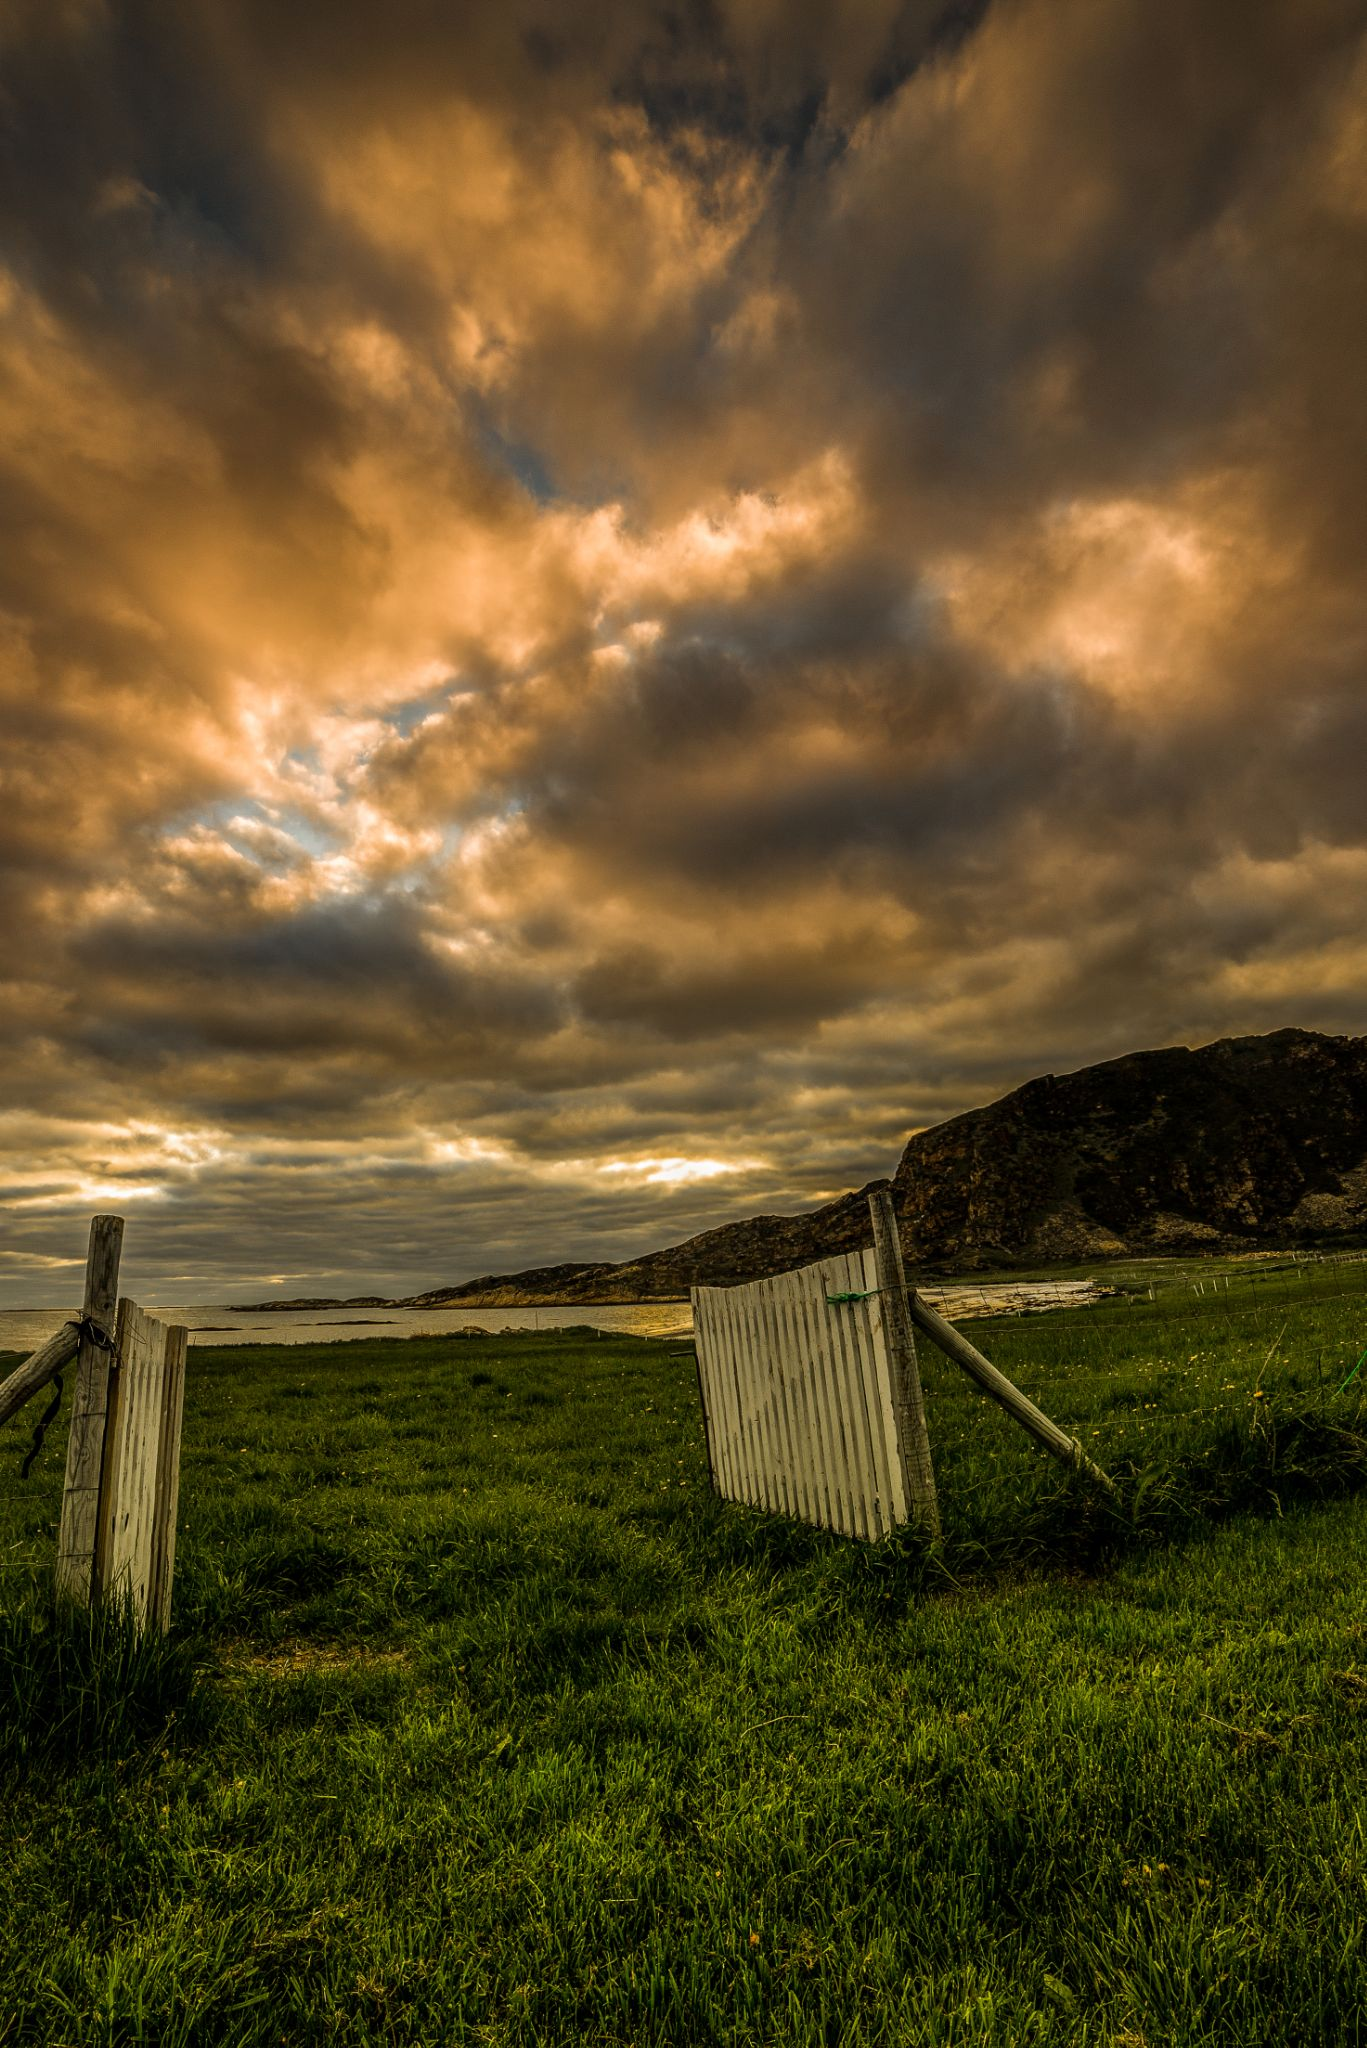 The golden gate by Terje Nilssen